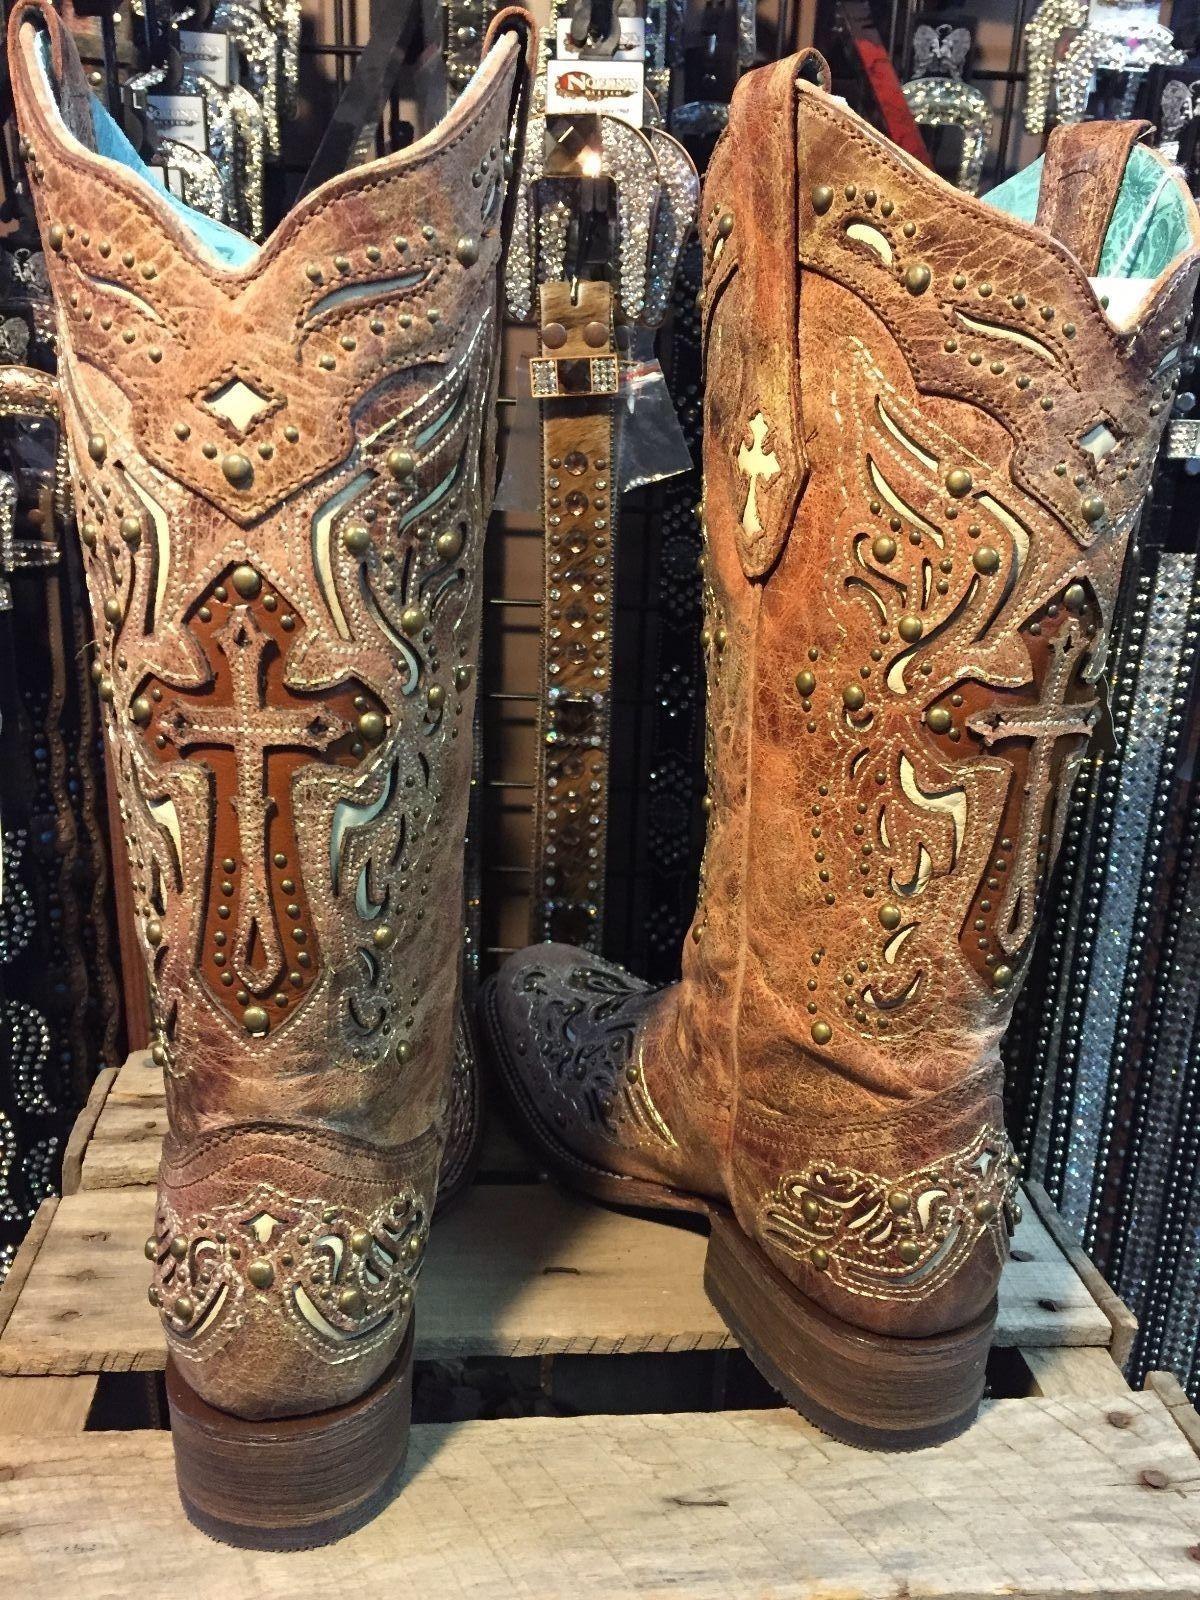 c9121e4905a Corral Ladies Cognac/Bone Inlay Cross & Studs Square Toe Boot C2856 ...